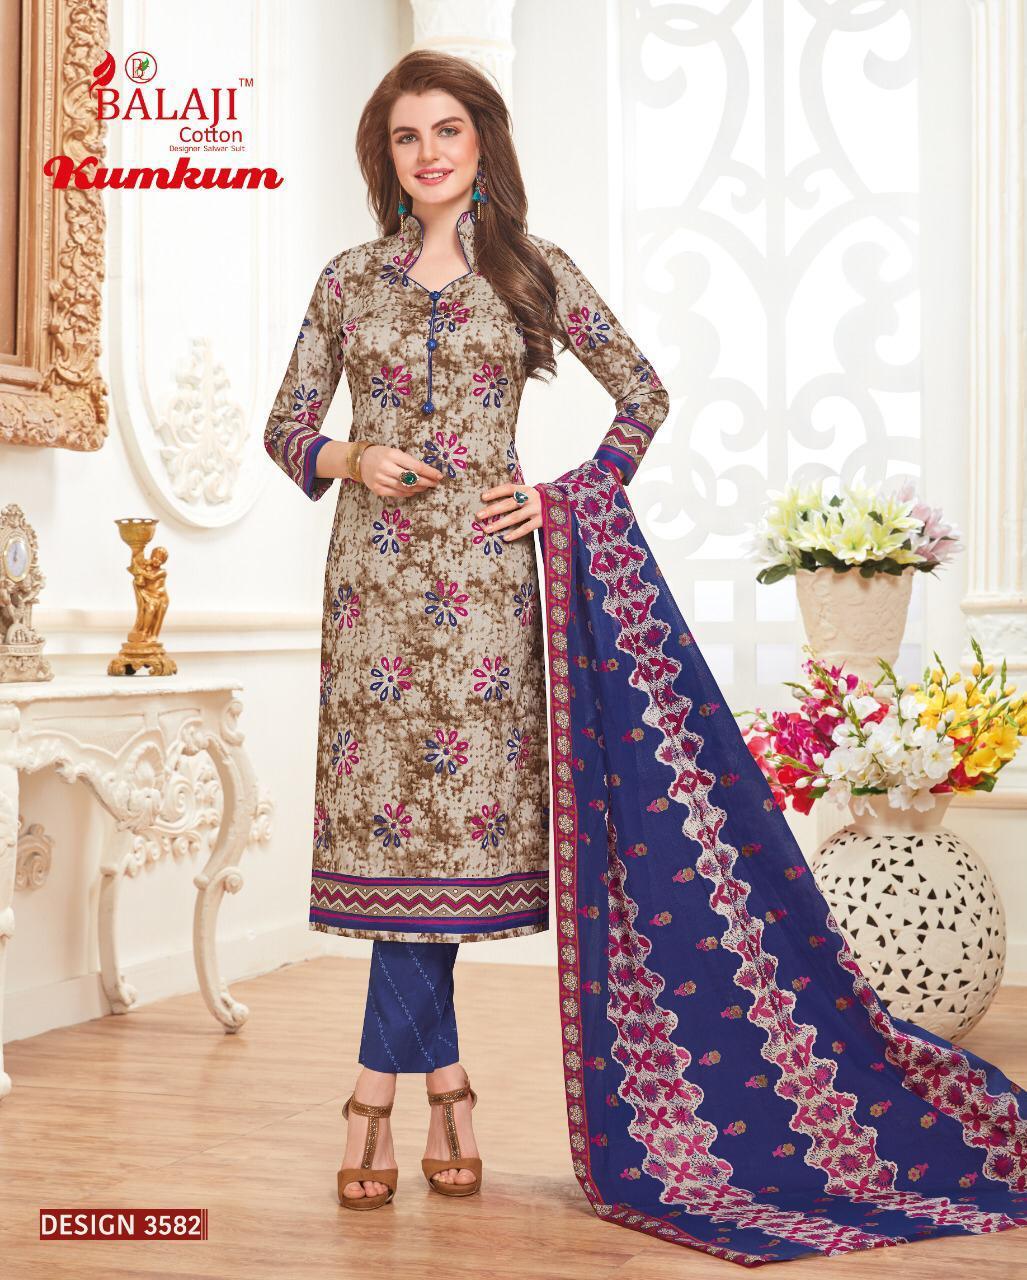 Balaji Cotton Kumkum 19 Cotton Designer Suits Wholesale